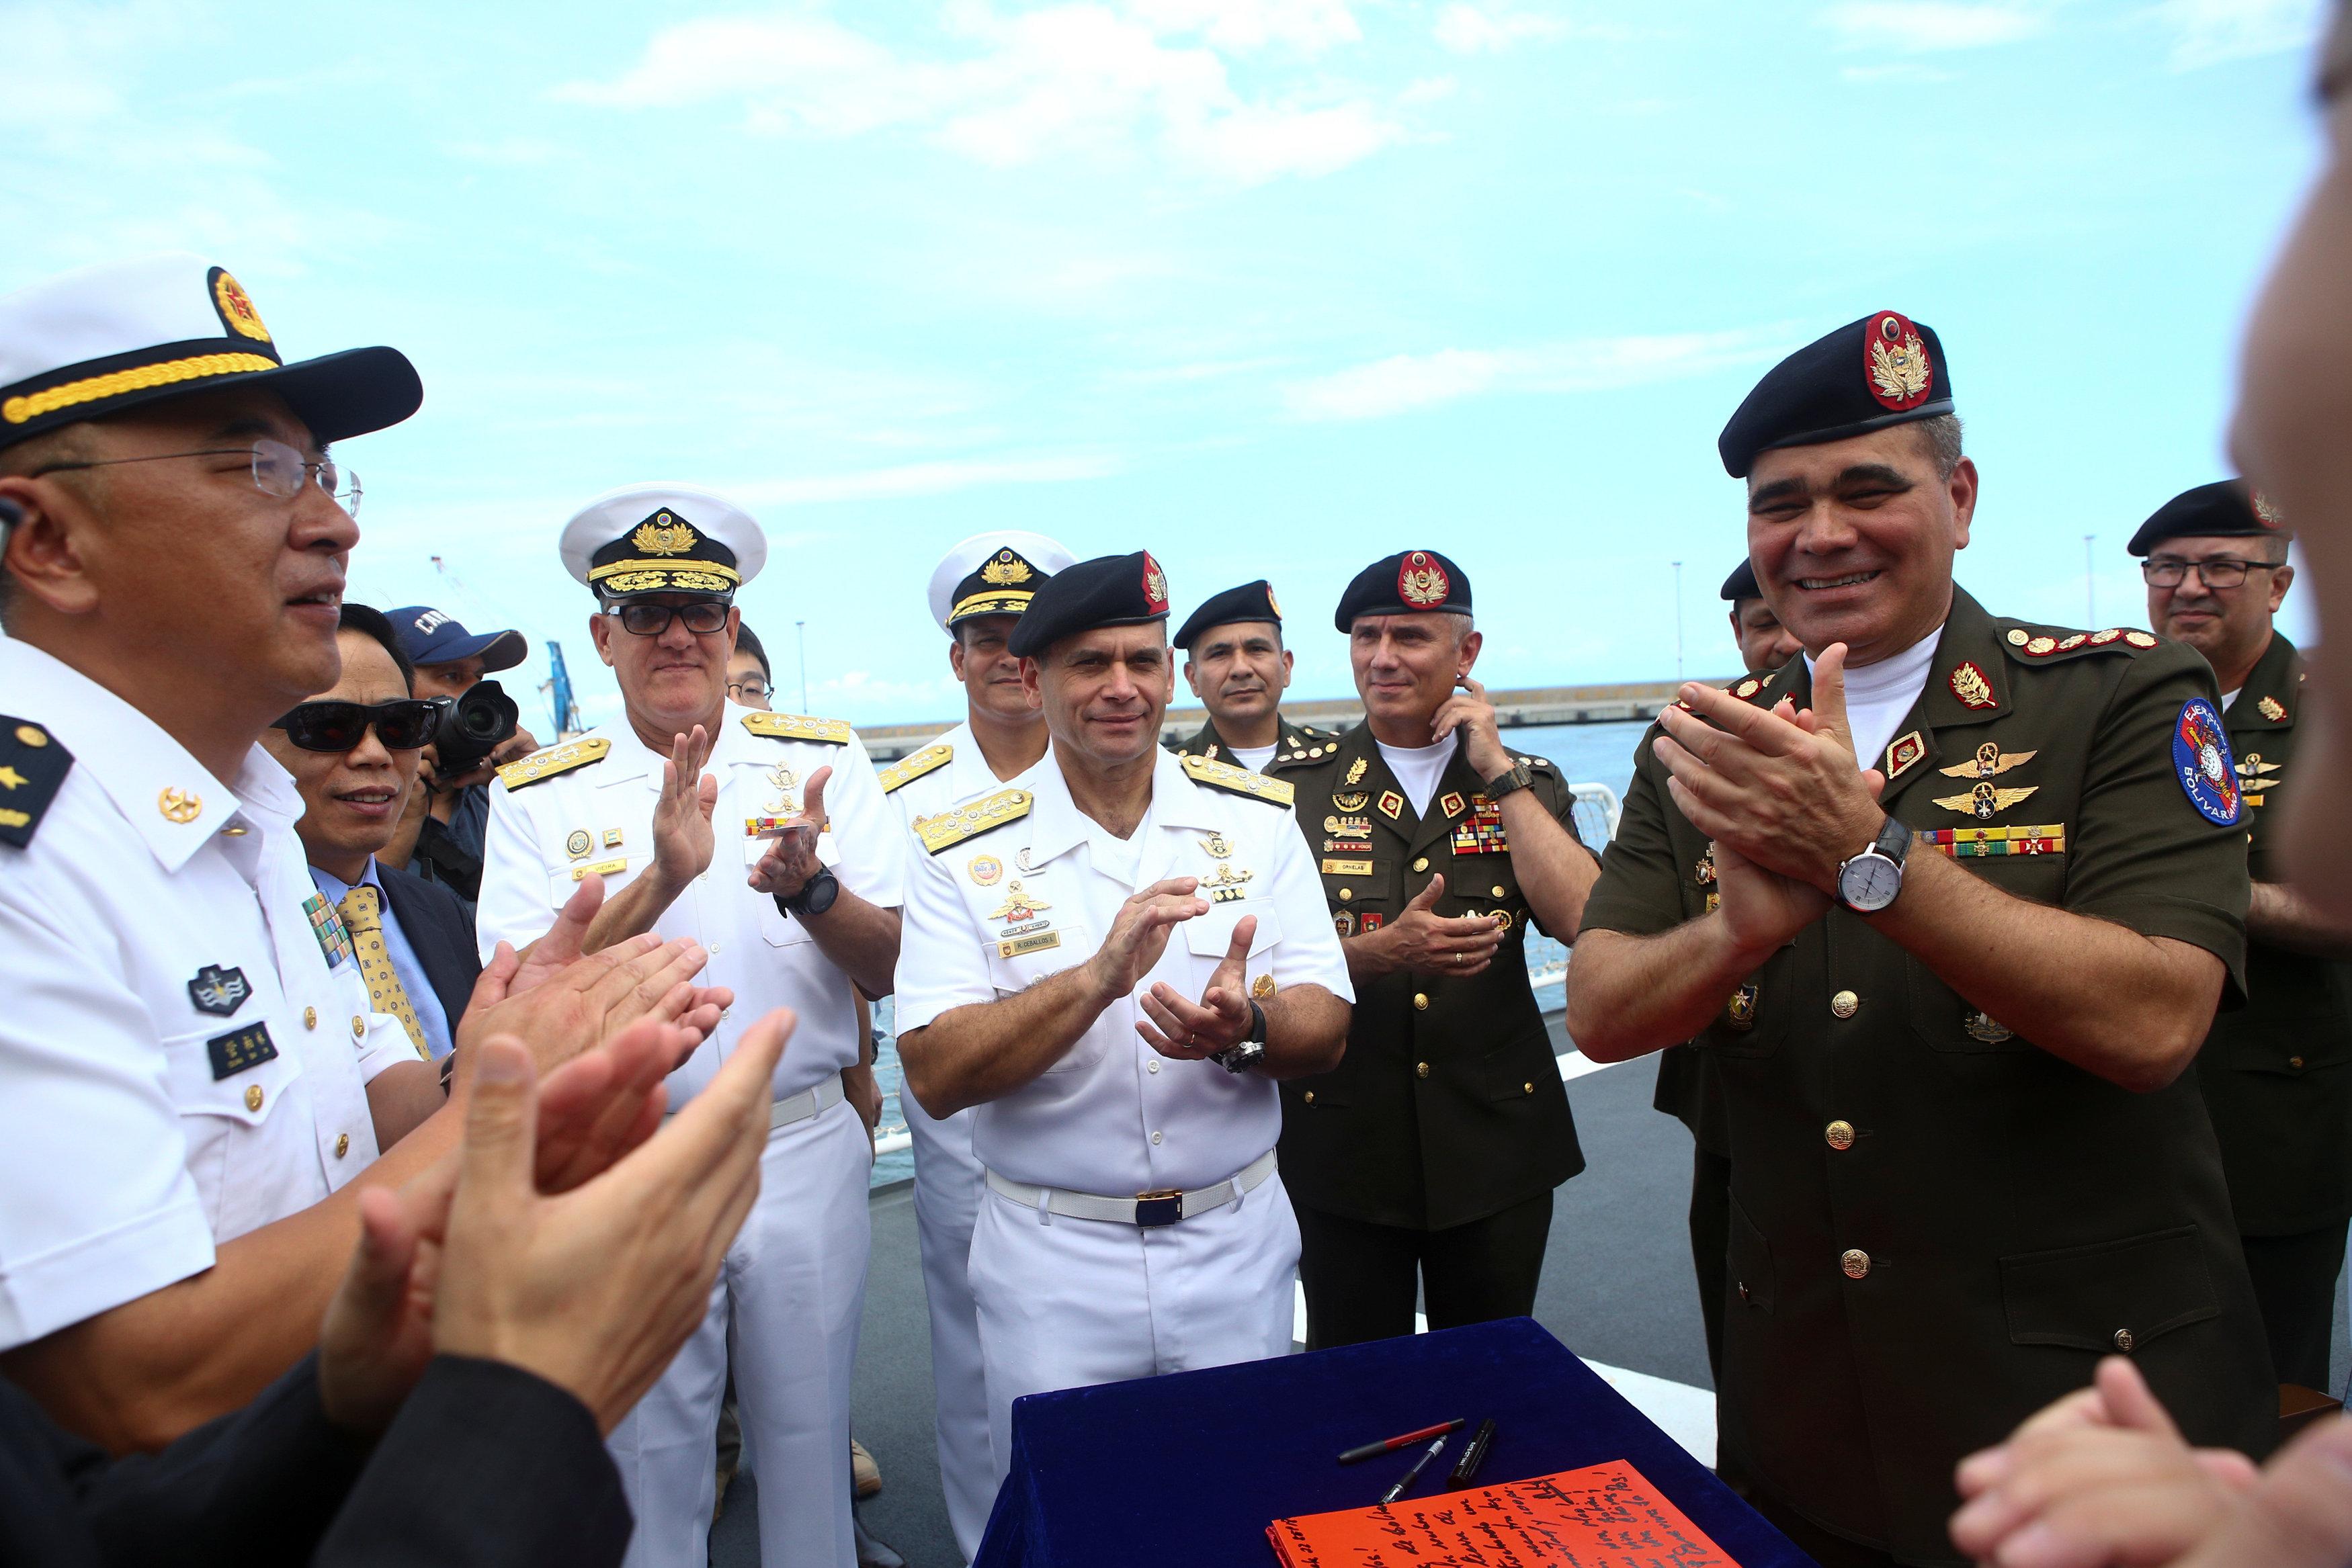 ploto-nosokomeio-esteile-i-kina-sti-venezoyela13